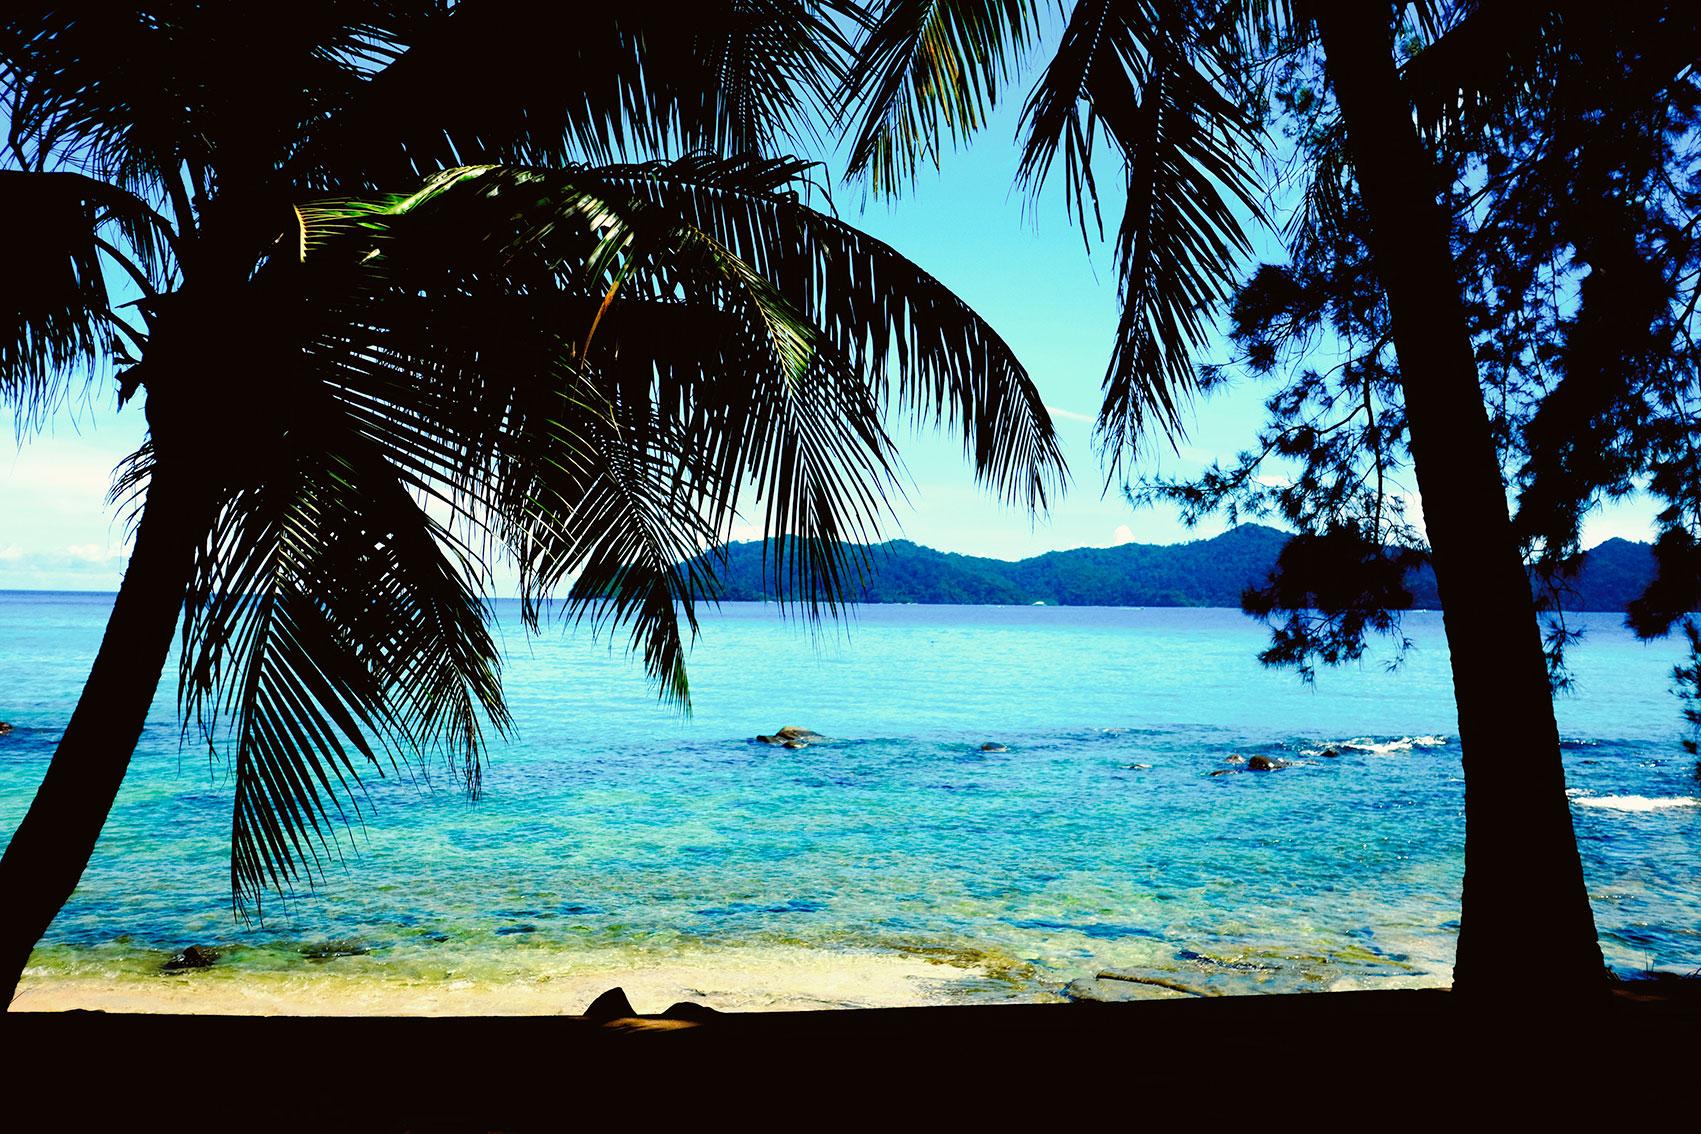 Manukan Island Kota Kinabalu